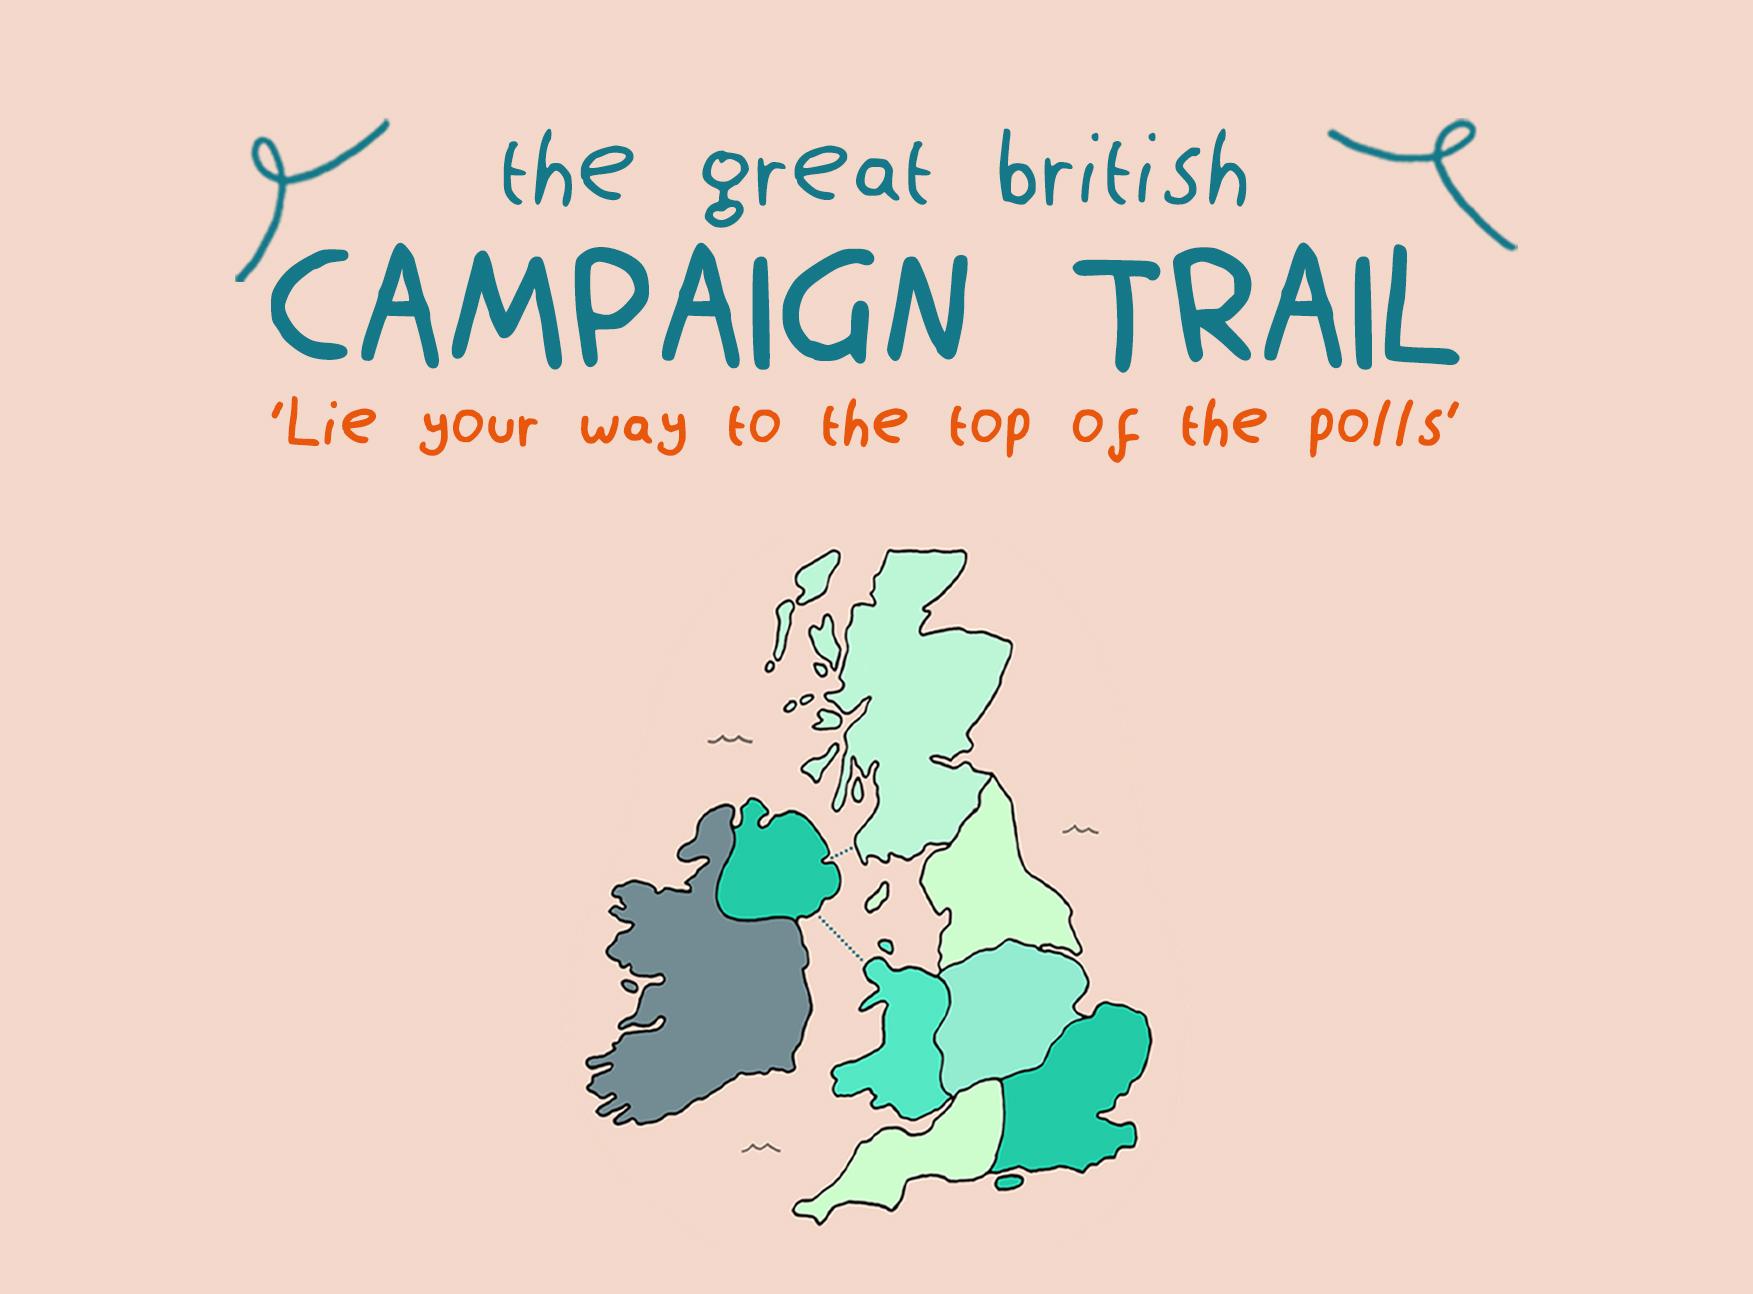 The Great British Campaign Trail